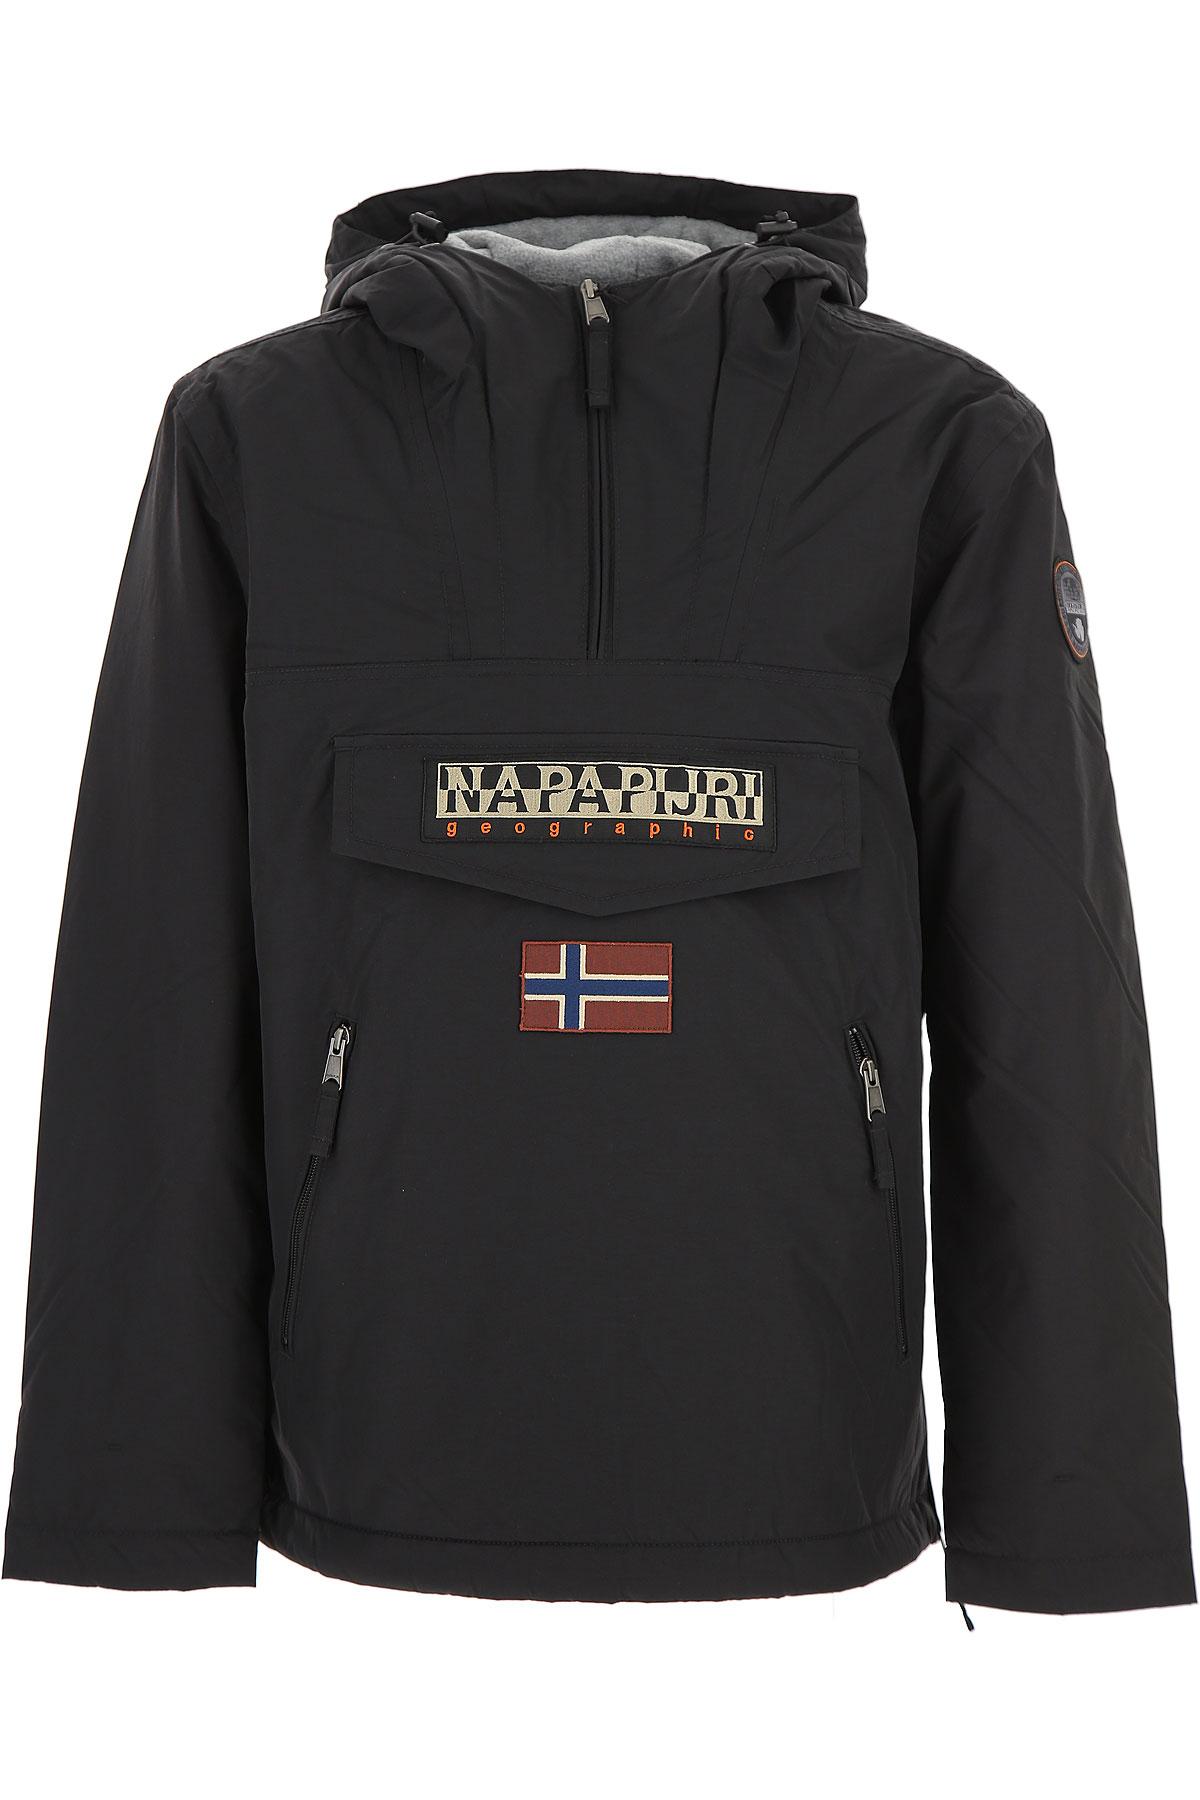 Image of Napapijri Down Jacket for Men, Puffer Ski Jacket, Black, polyamide, 2017, L M S XL XS